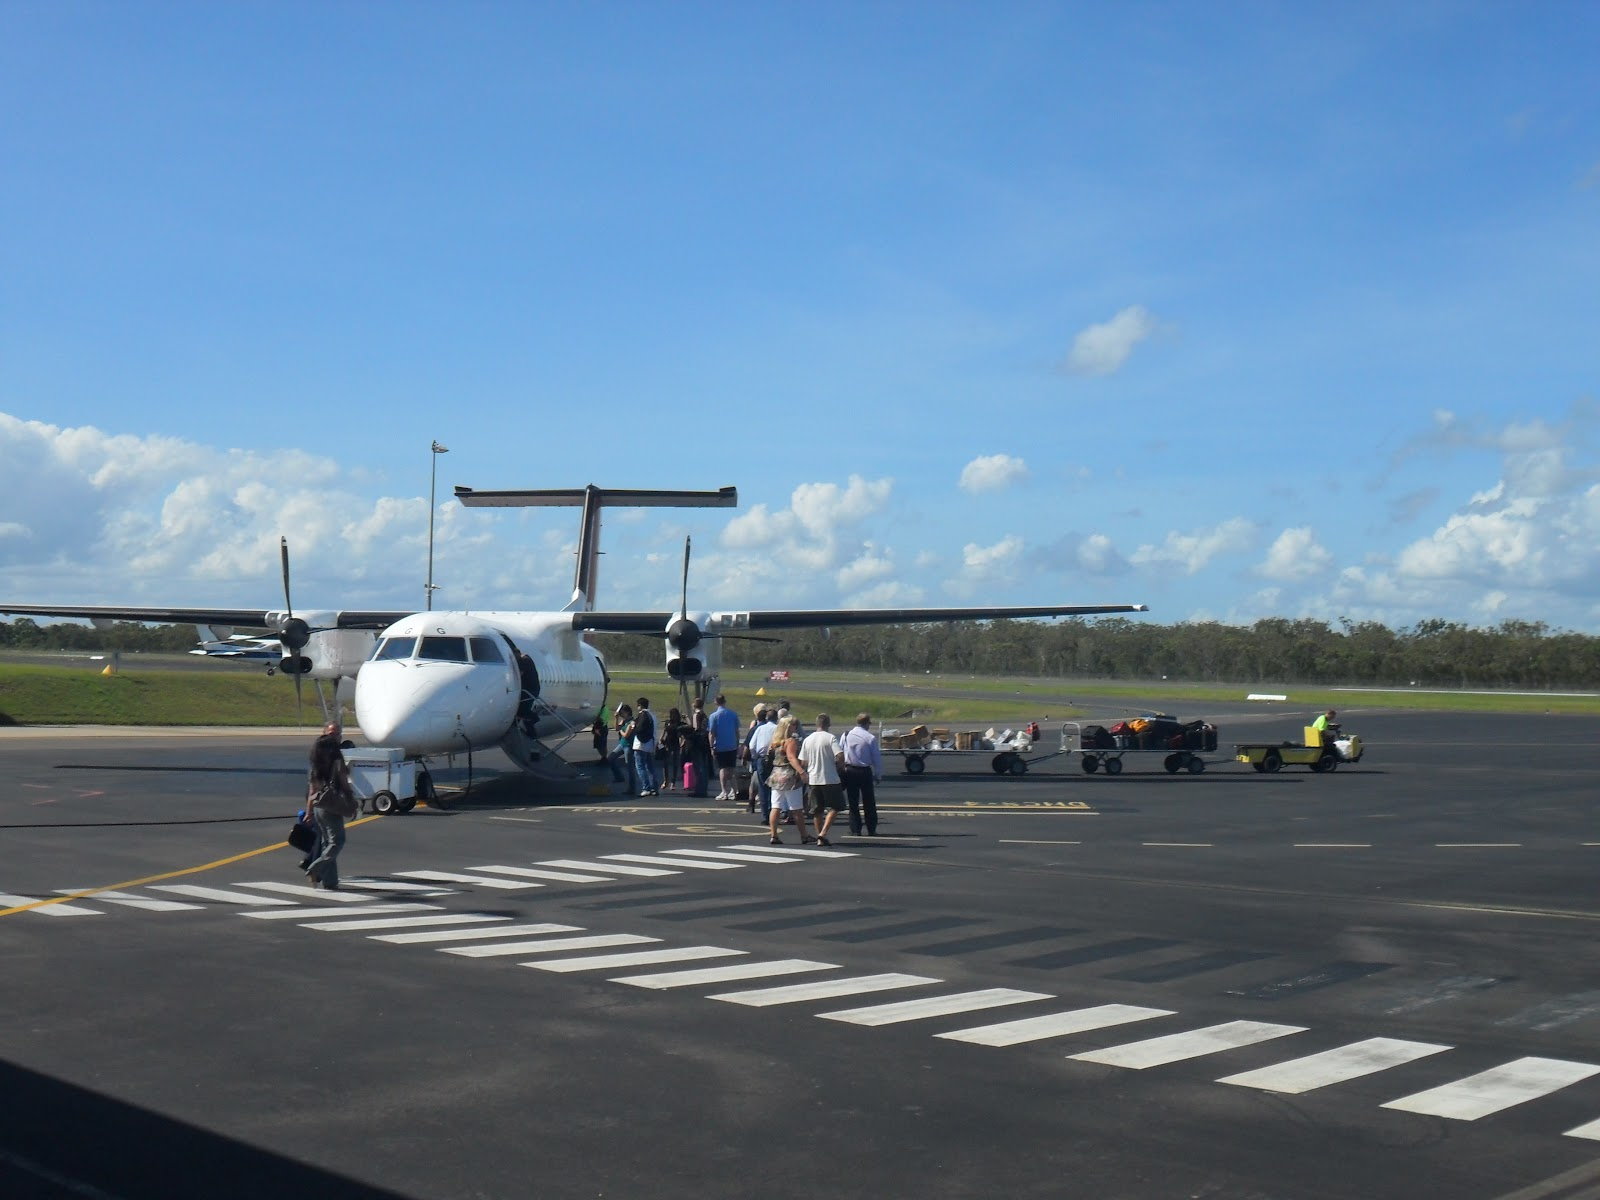 sydney to hervey bay flights - photo#22